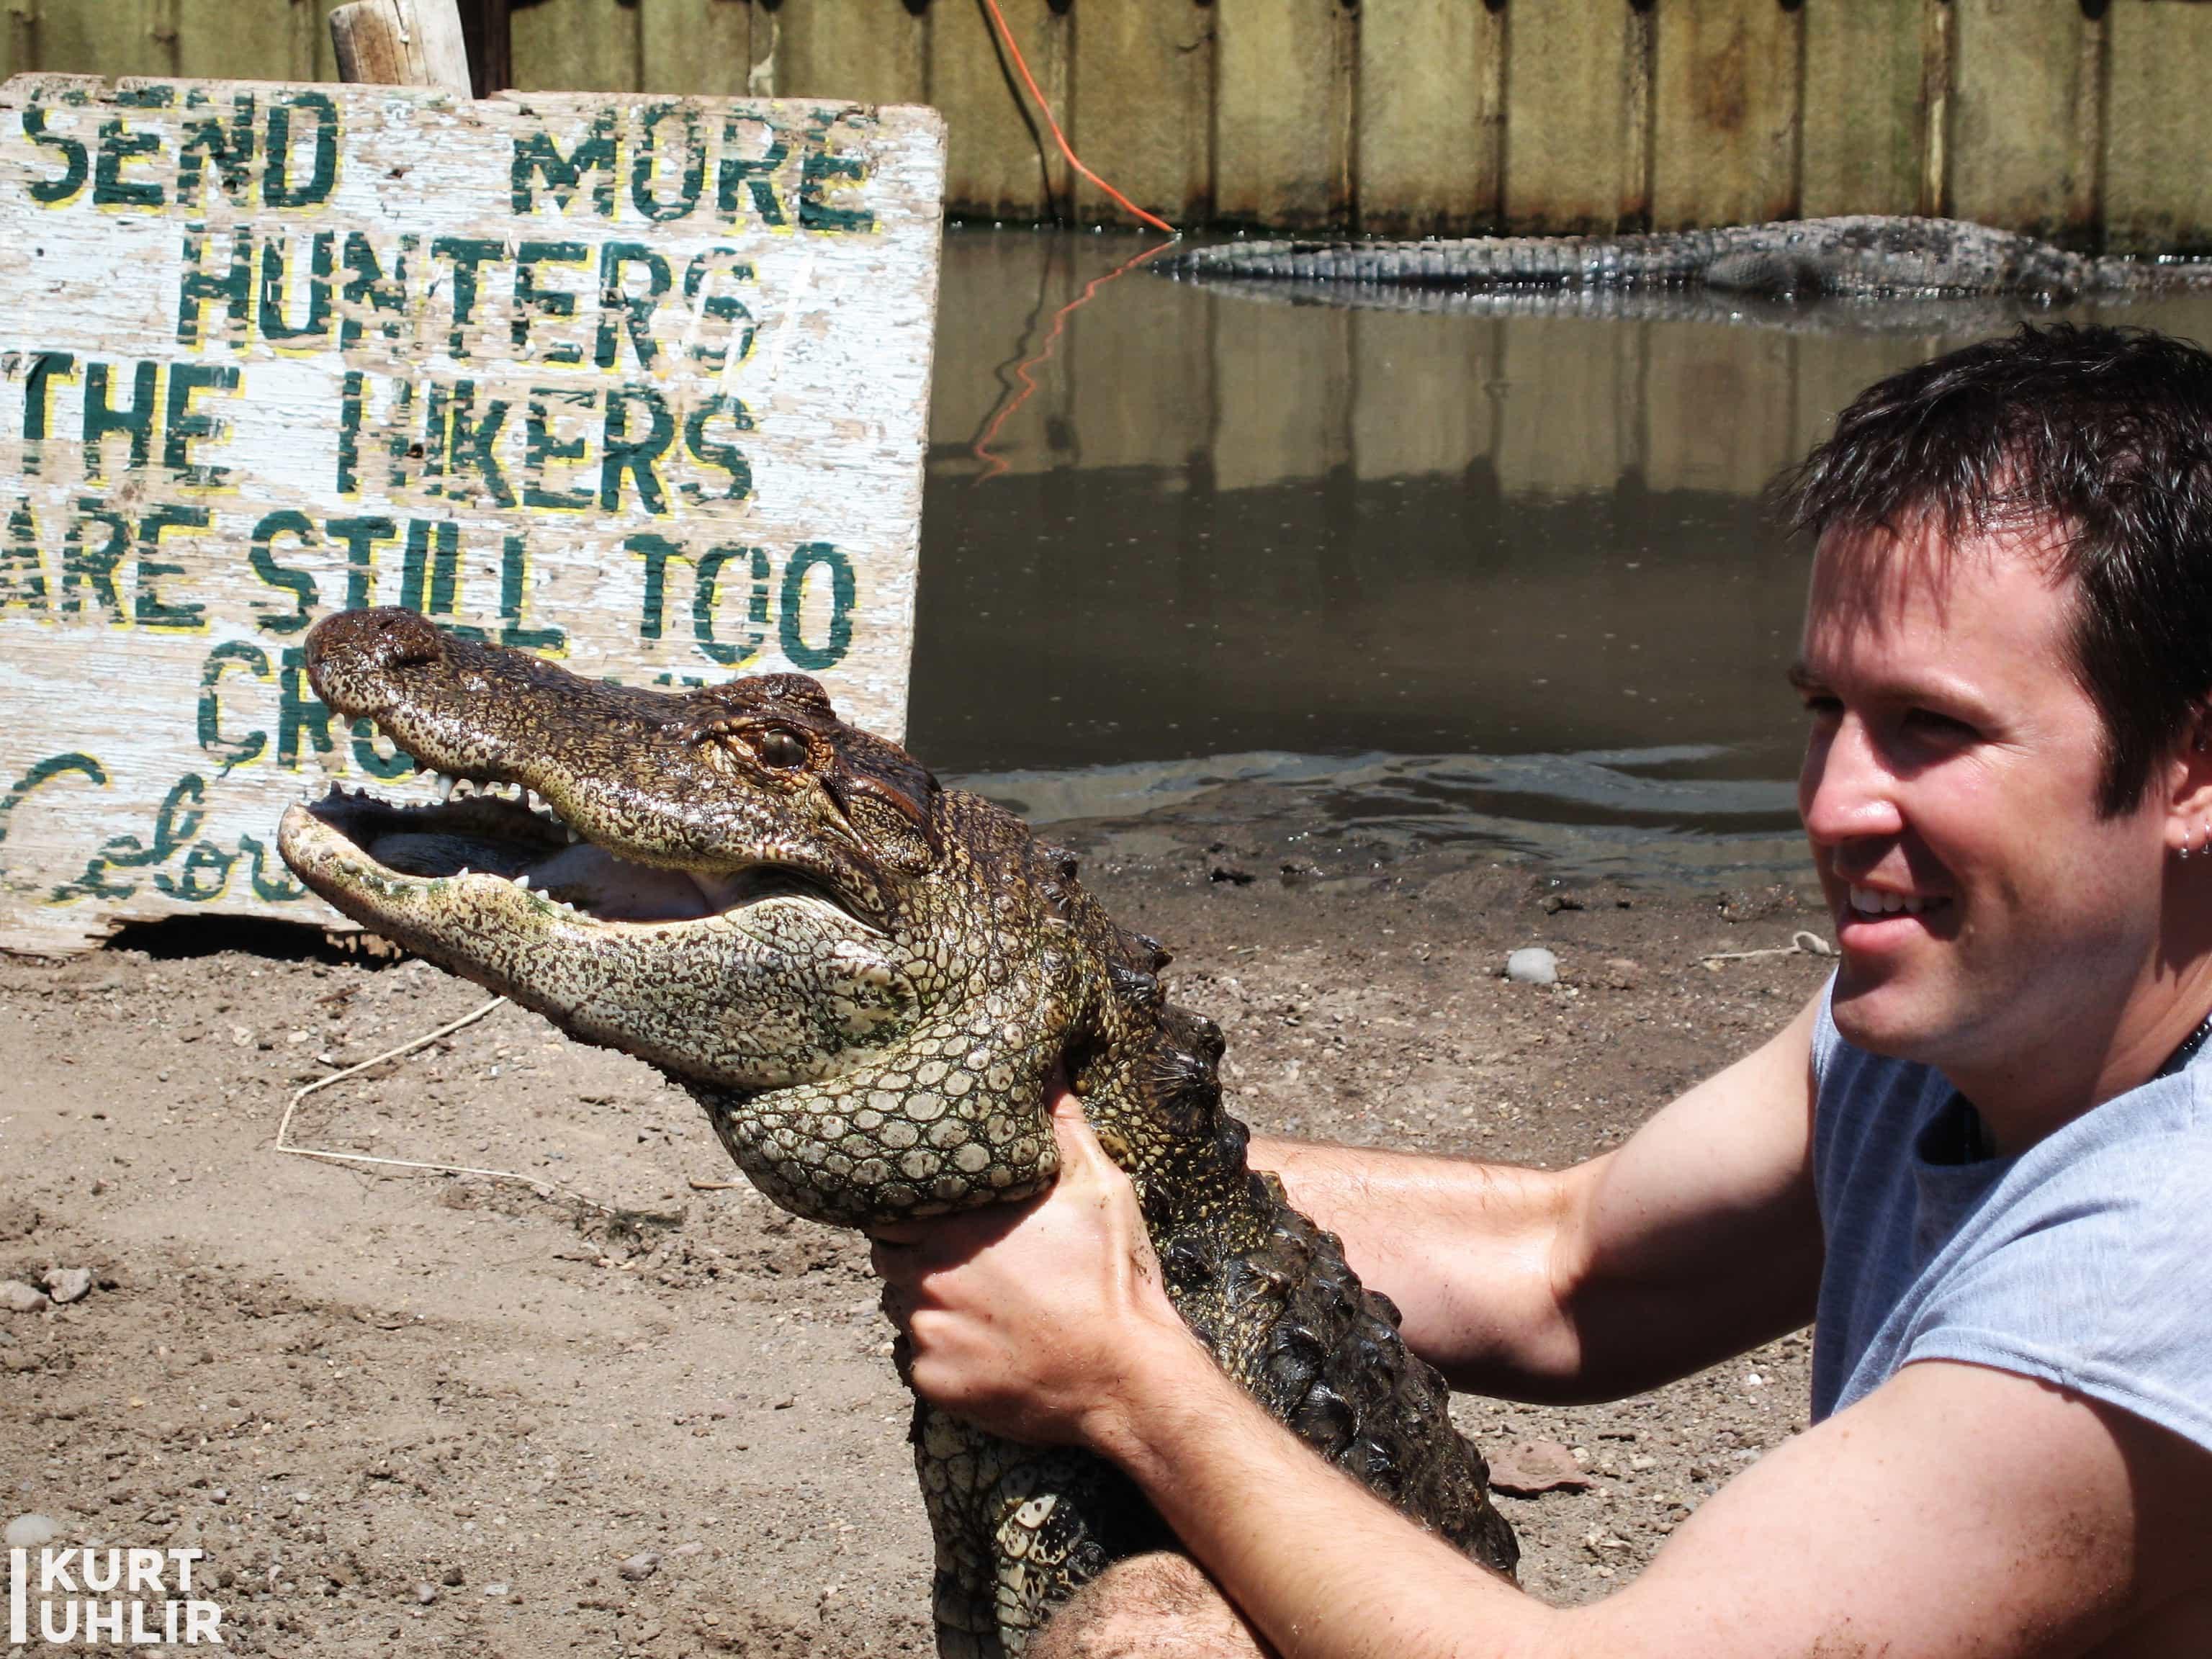 Kurt Uhlir handling a mid-sized alligator